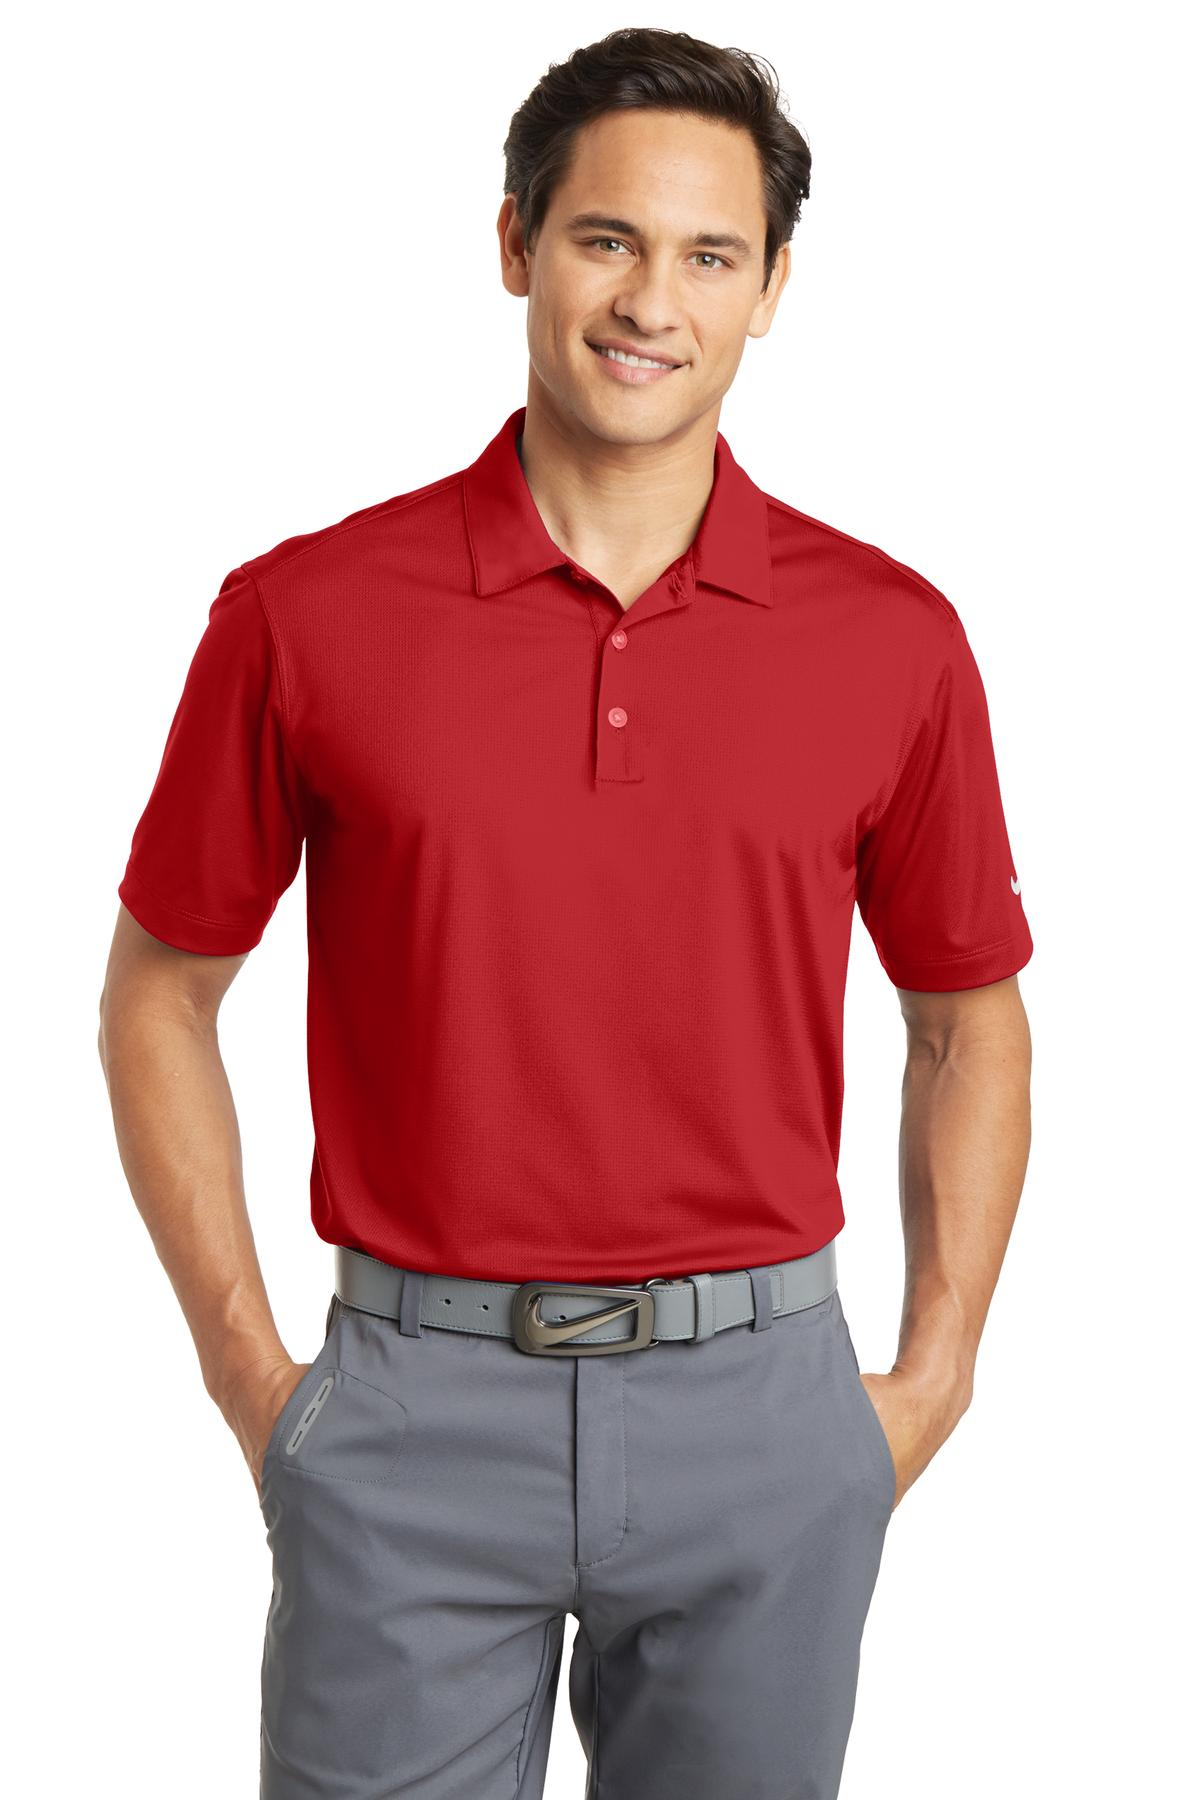 Nike golf dri fit vertical mesh polo 637167 for Nike golf polo shirts wholesale